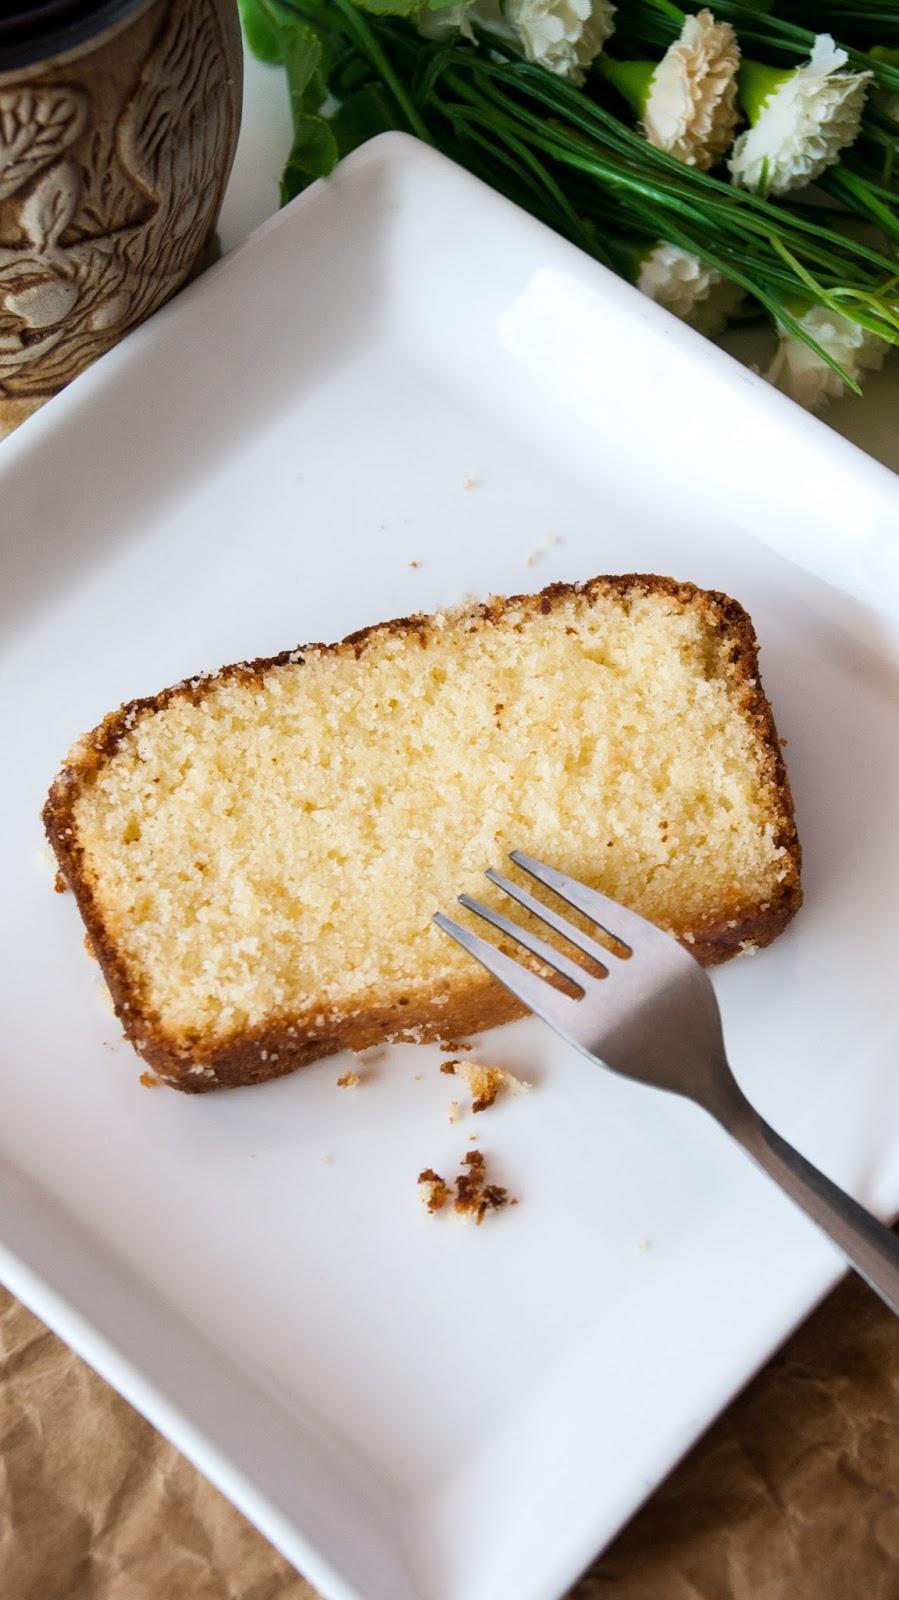 Http Www Foodnetwork Com Recipes Ina Garten Lemon Cake Recipe